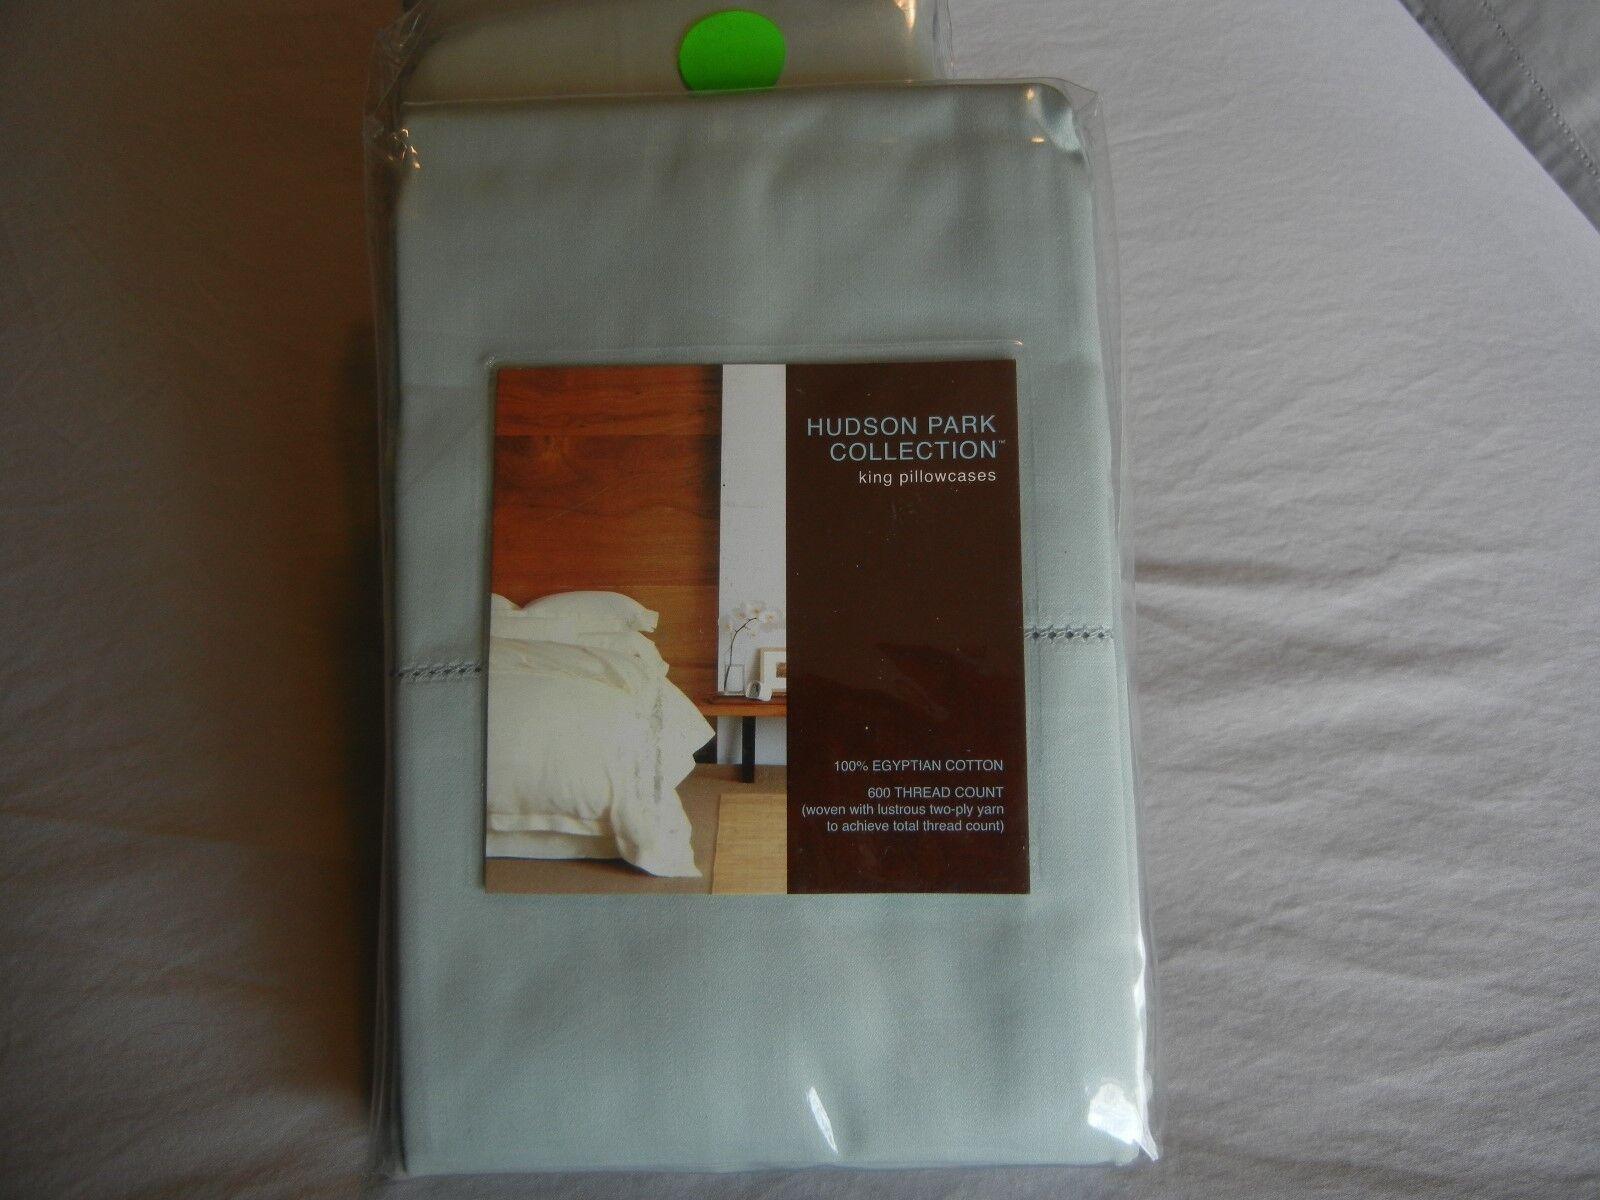 New Hudson Park 600 TC 100% Egyptian Cotton King Pillowcases Seaglass